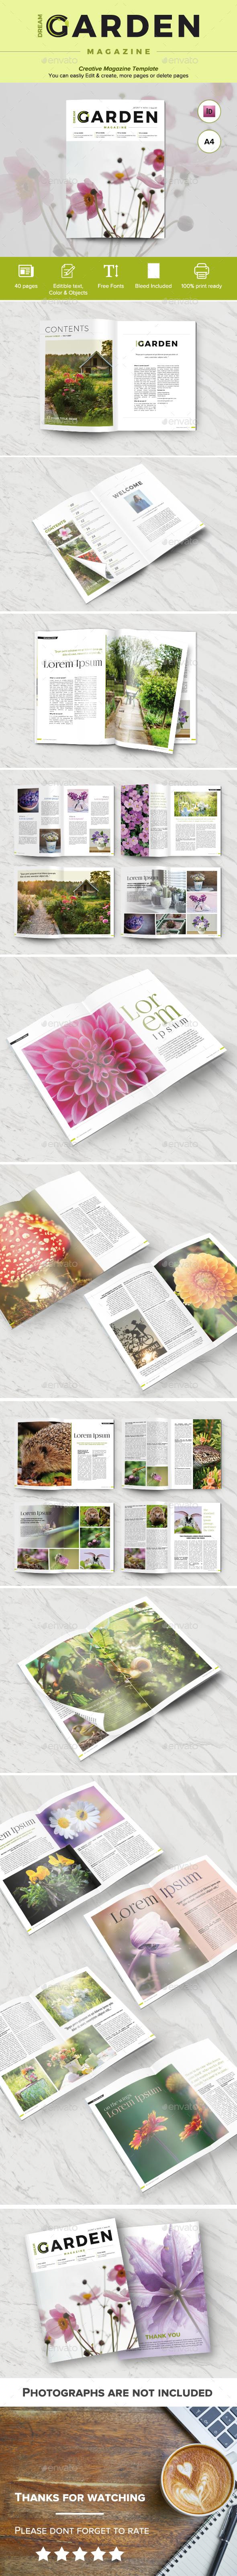 Dream Garden Magazine - Magazines Print Templates